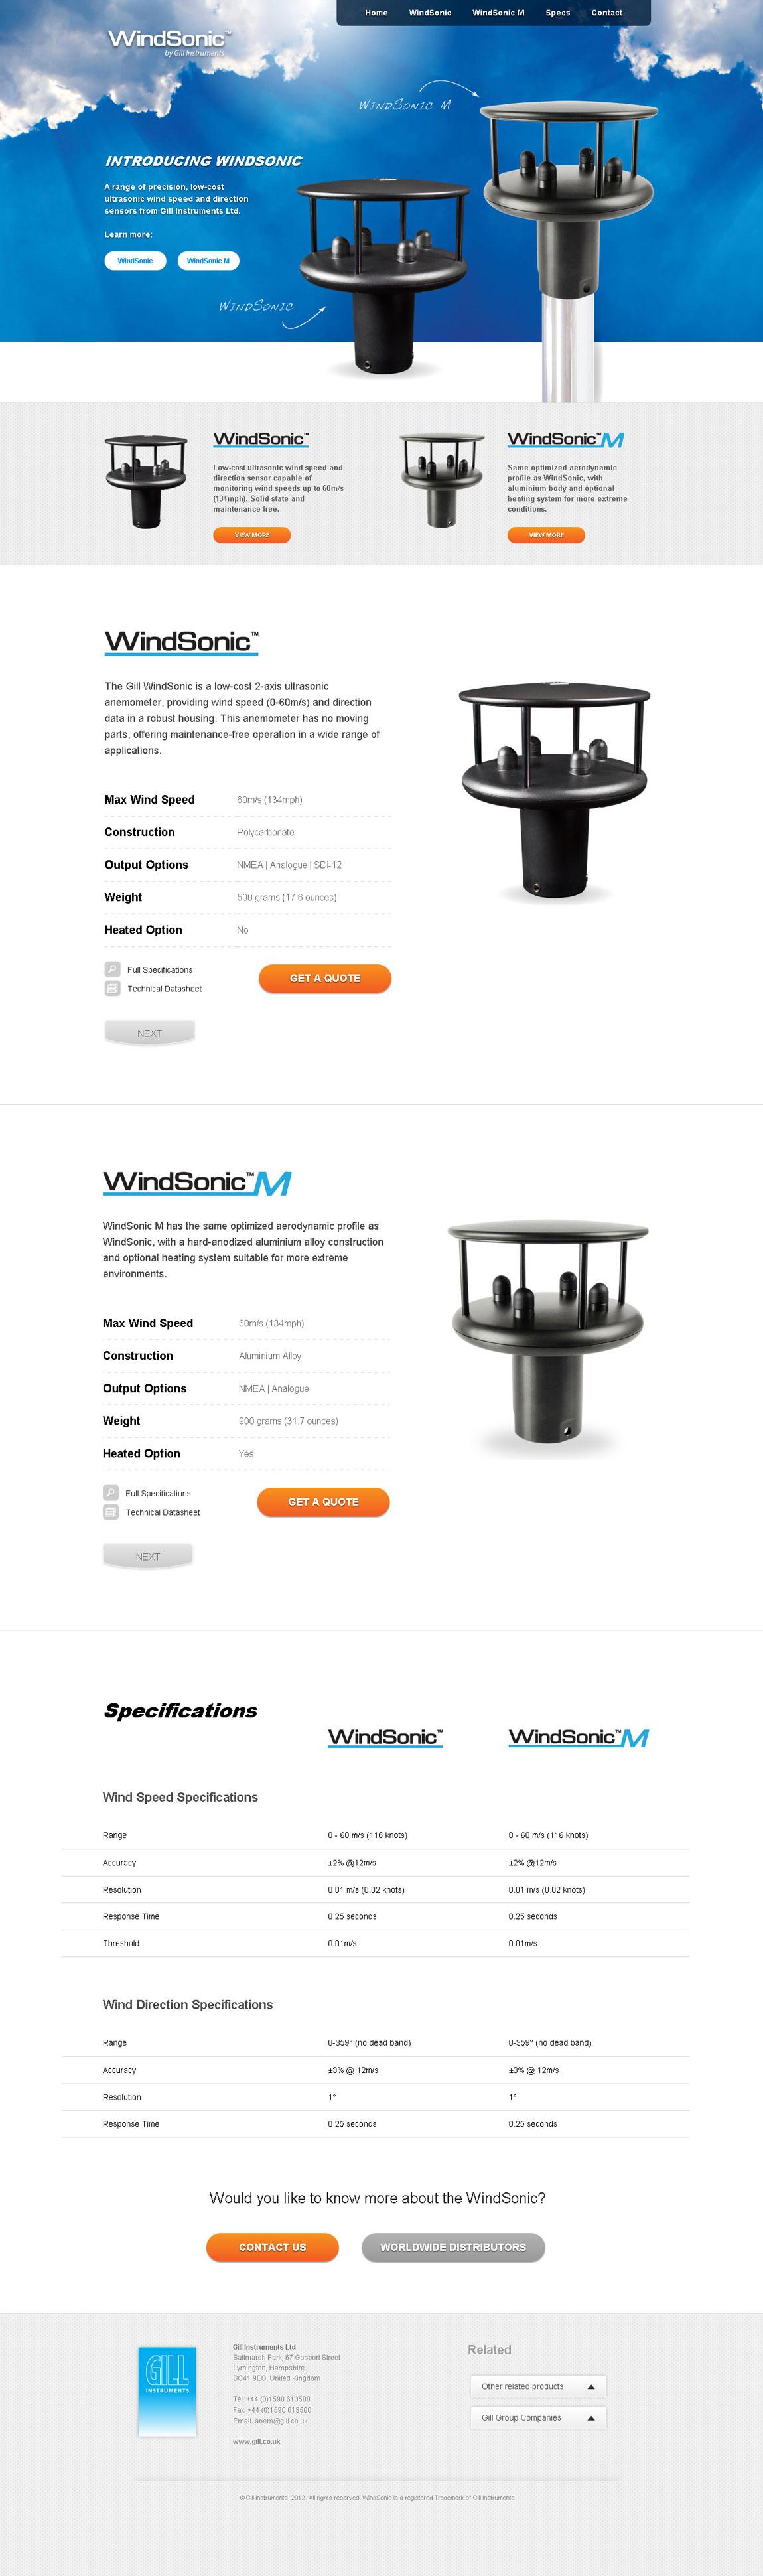 WindSonic Wind Sensor Website Screenshot